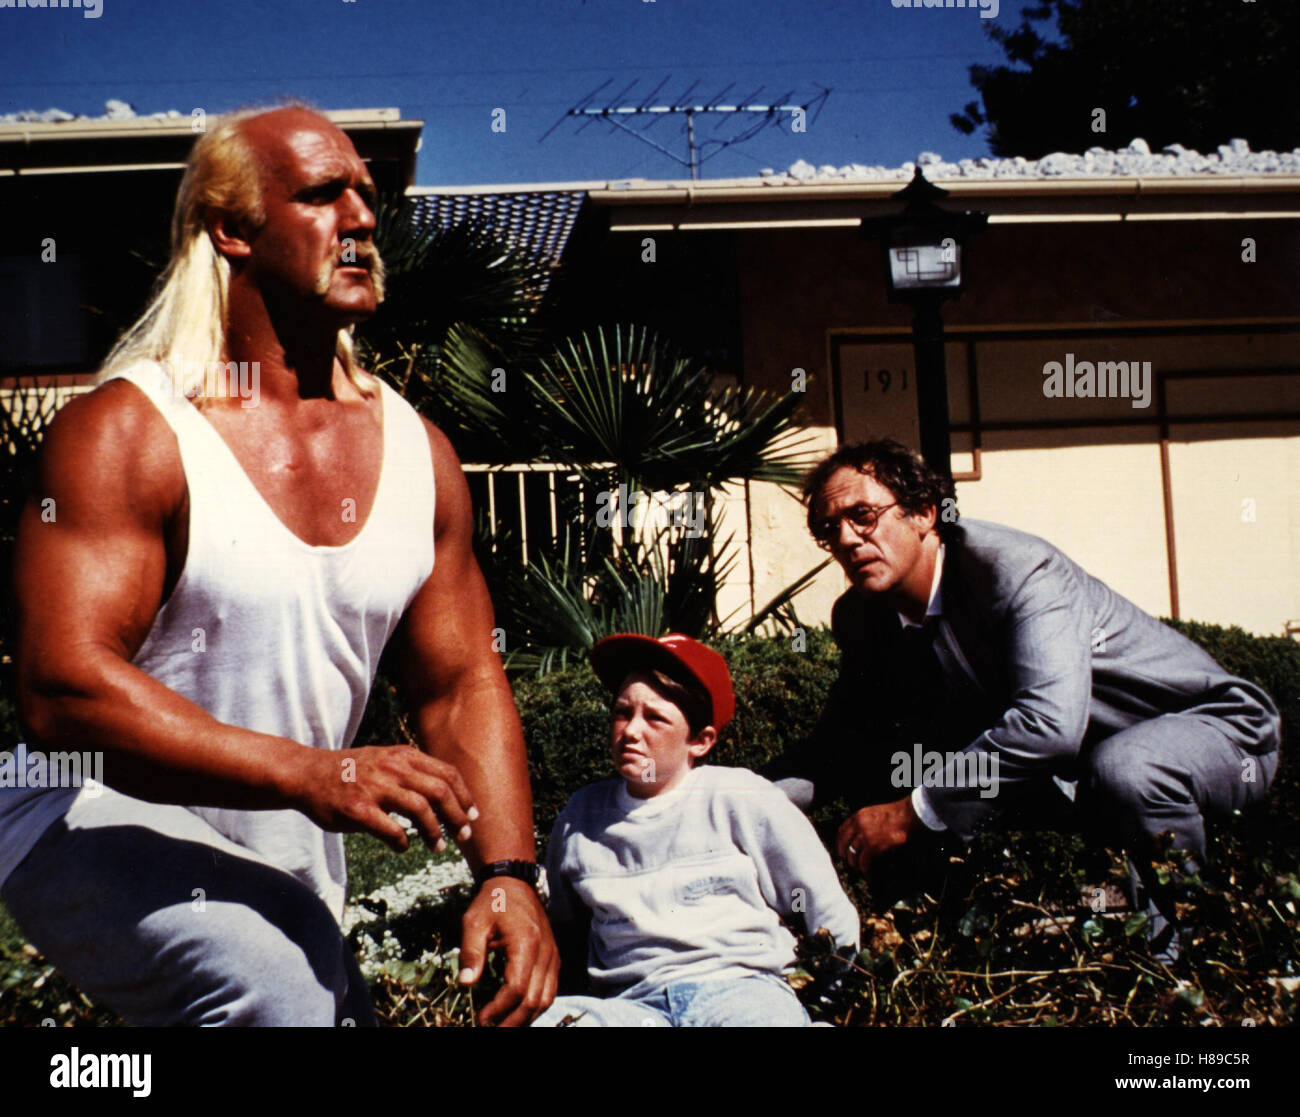 Der Ritter aus dem All, (SUBURBAN COMMANDO) USA 1991, Regie: Burt Kennedy, HULK HOGAN + CHRISTOPHER LLOYD - Stock Image